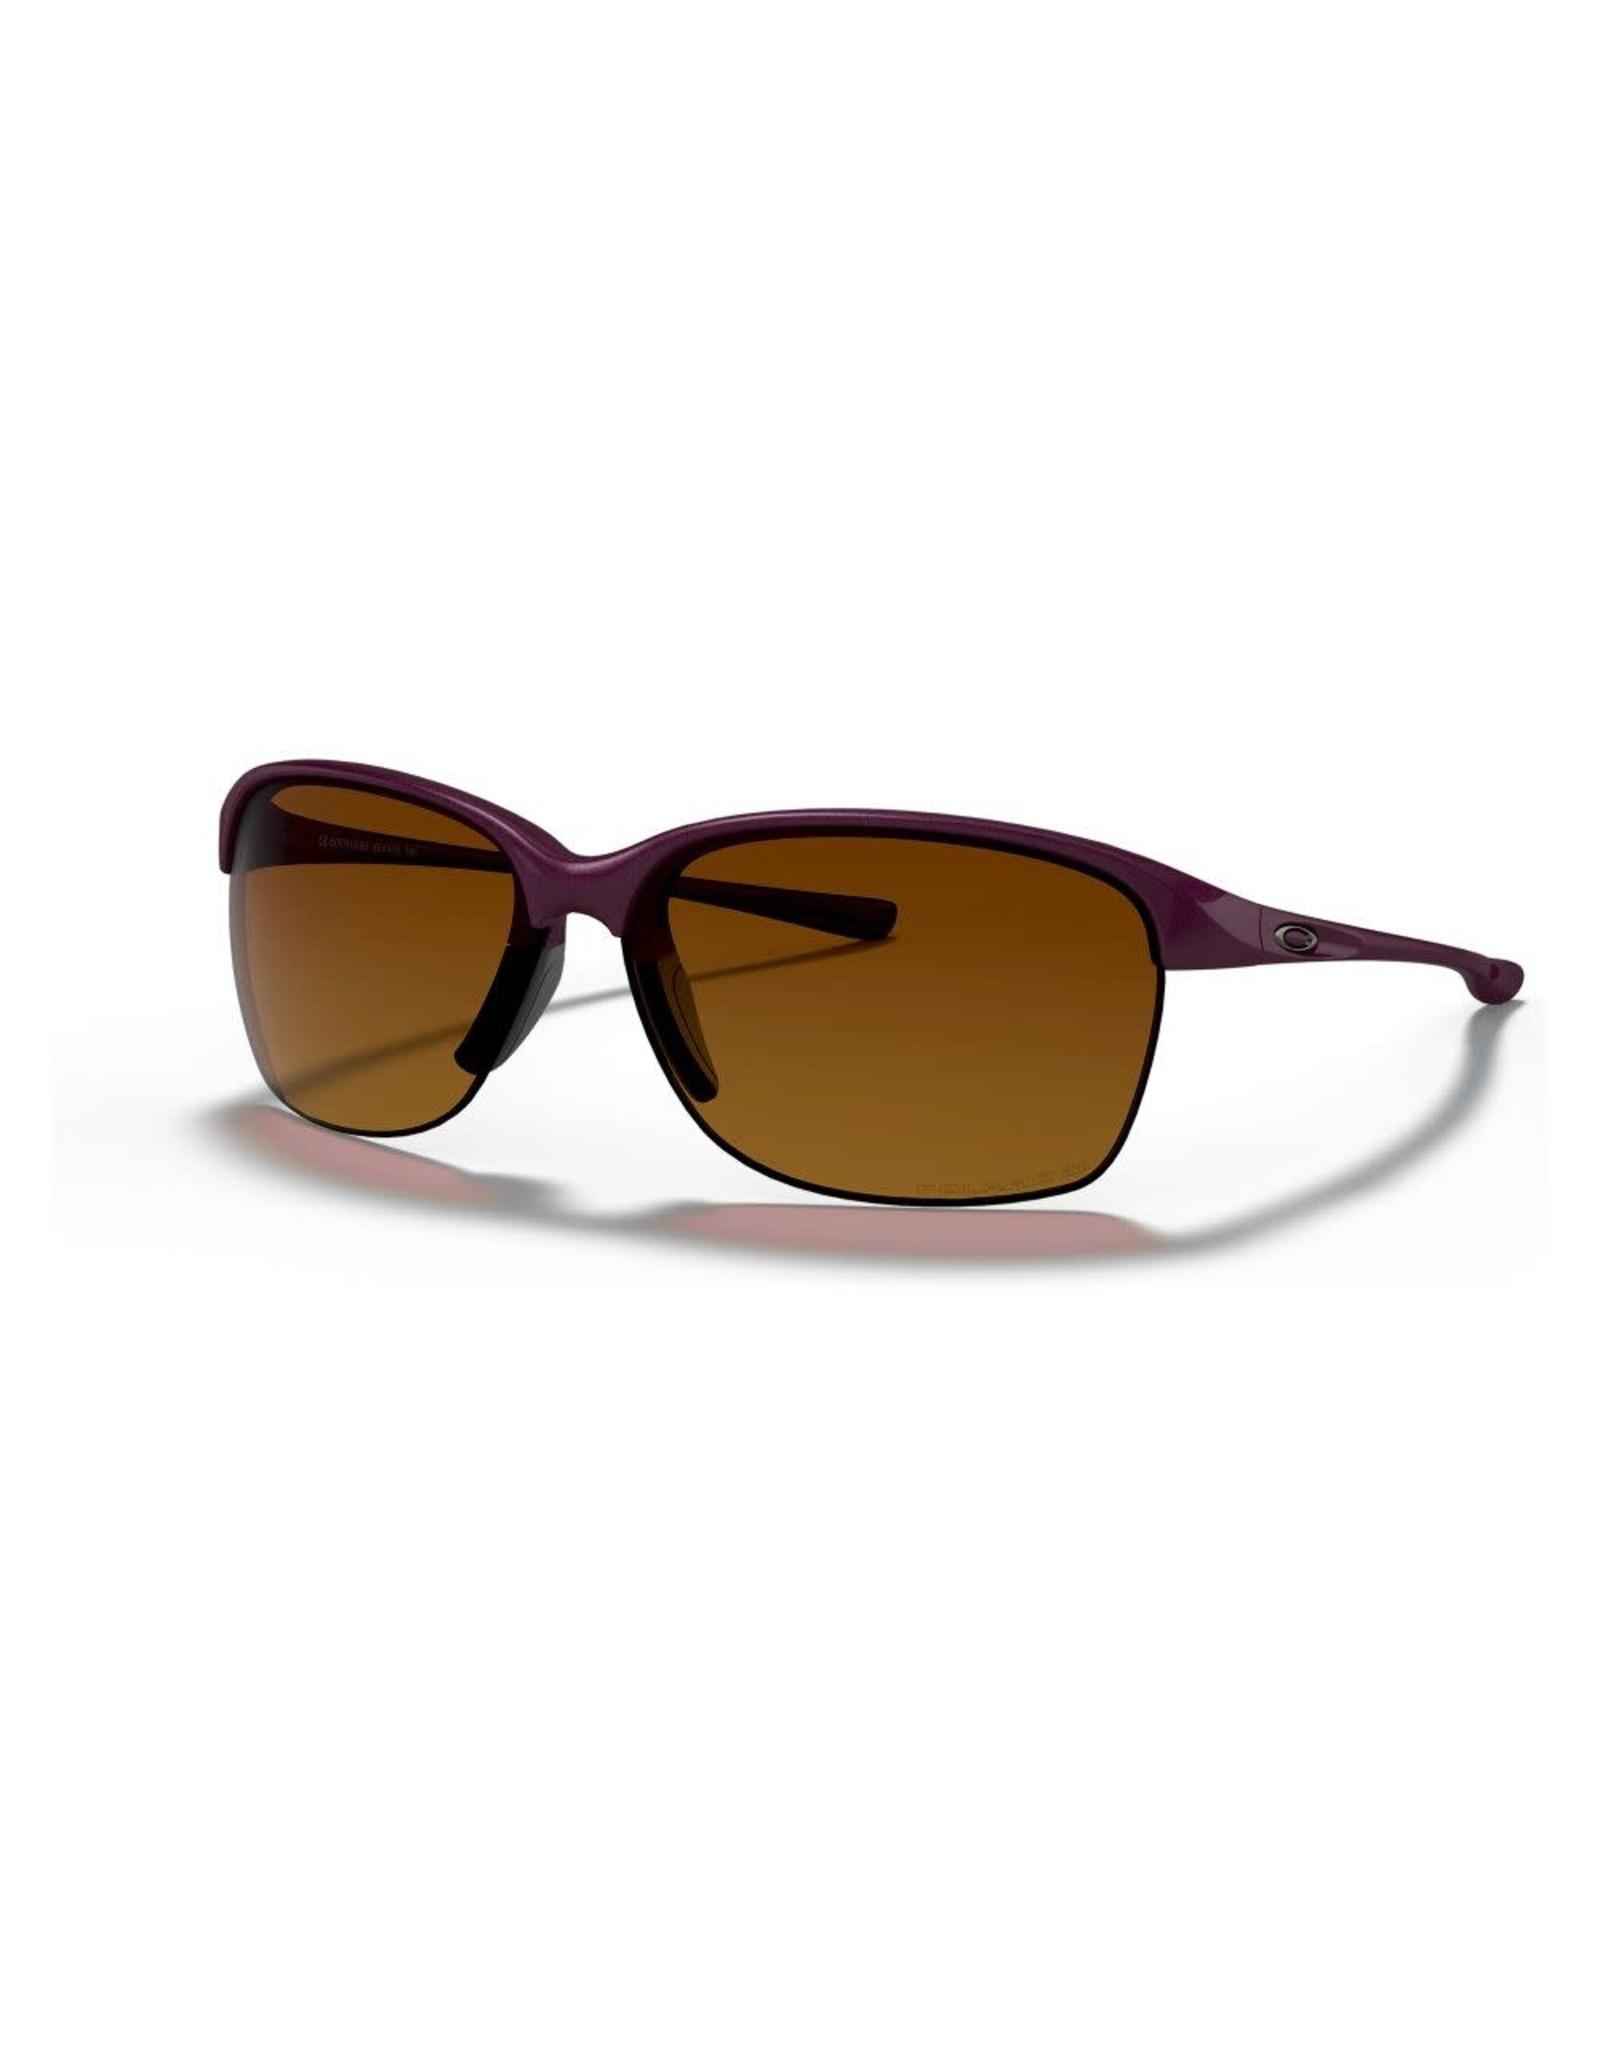 OAKLEY Oakley Unstoppable lunette raspberry spritzer brown gradient polarisée